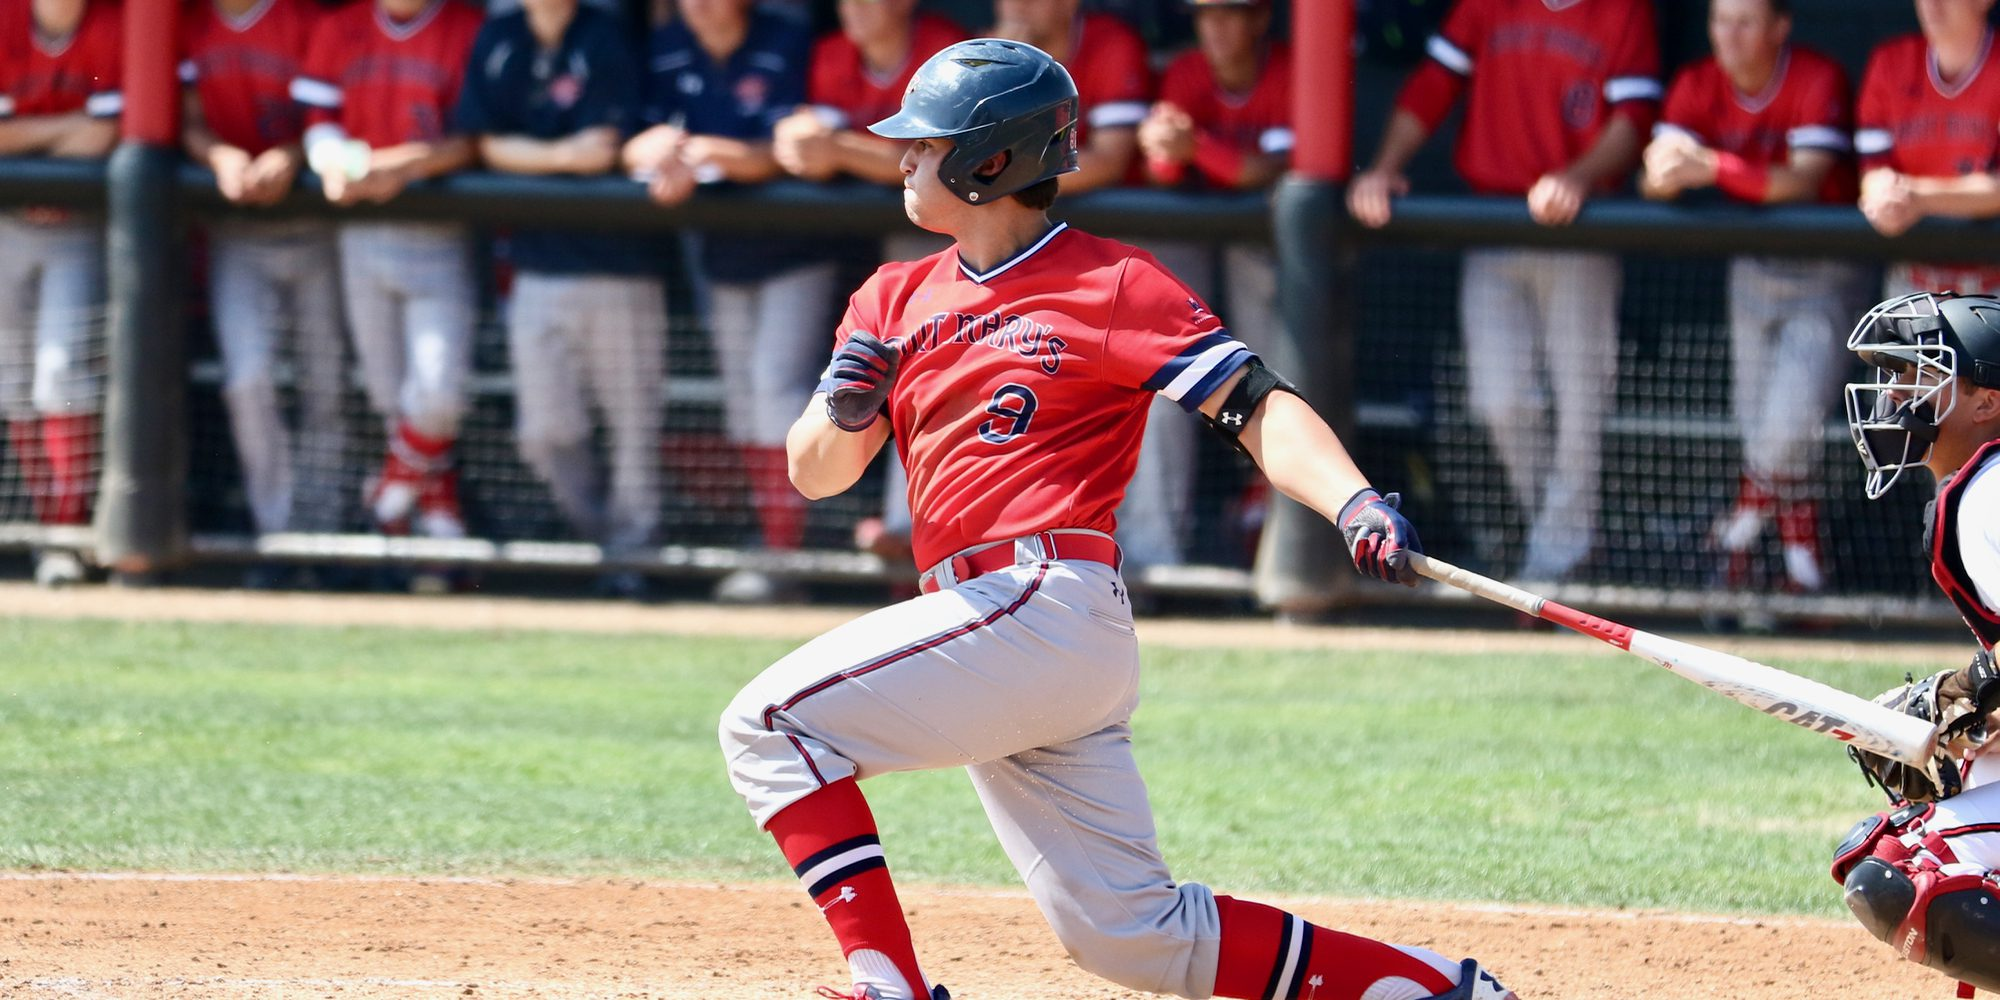 prep baseball report ohio